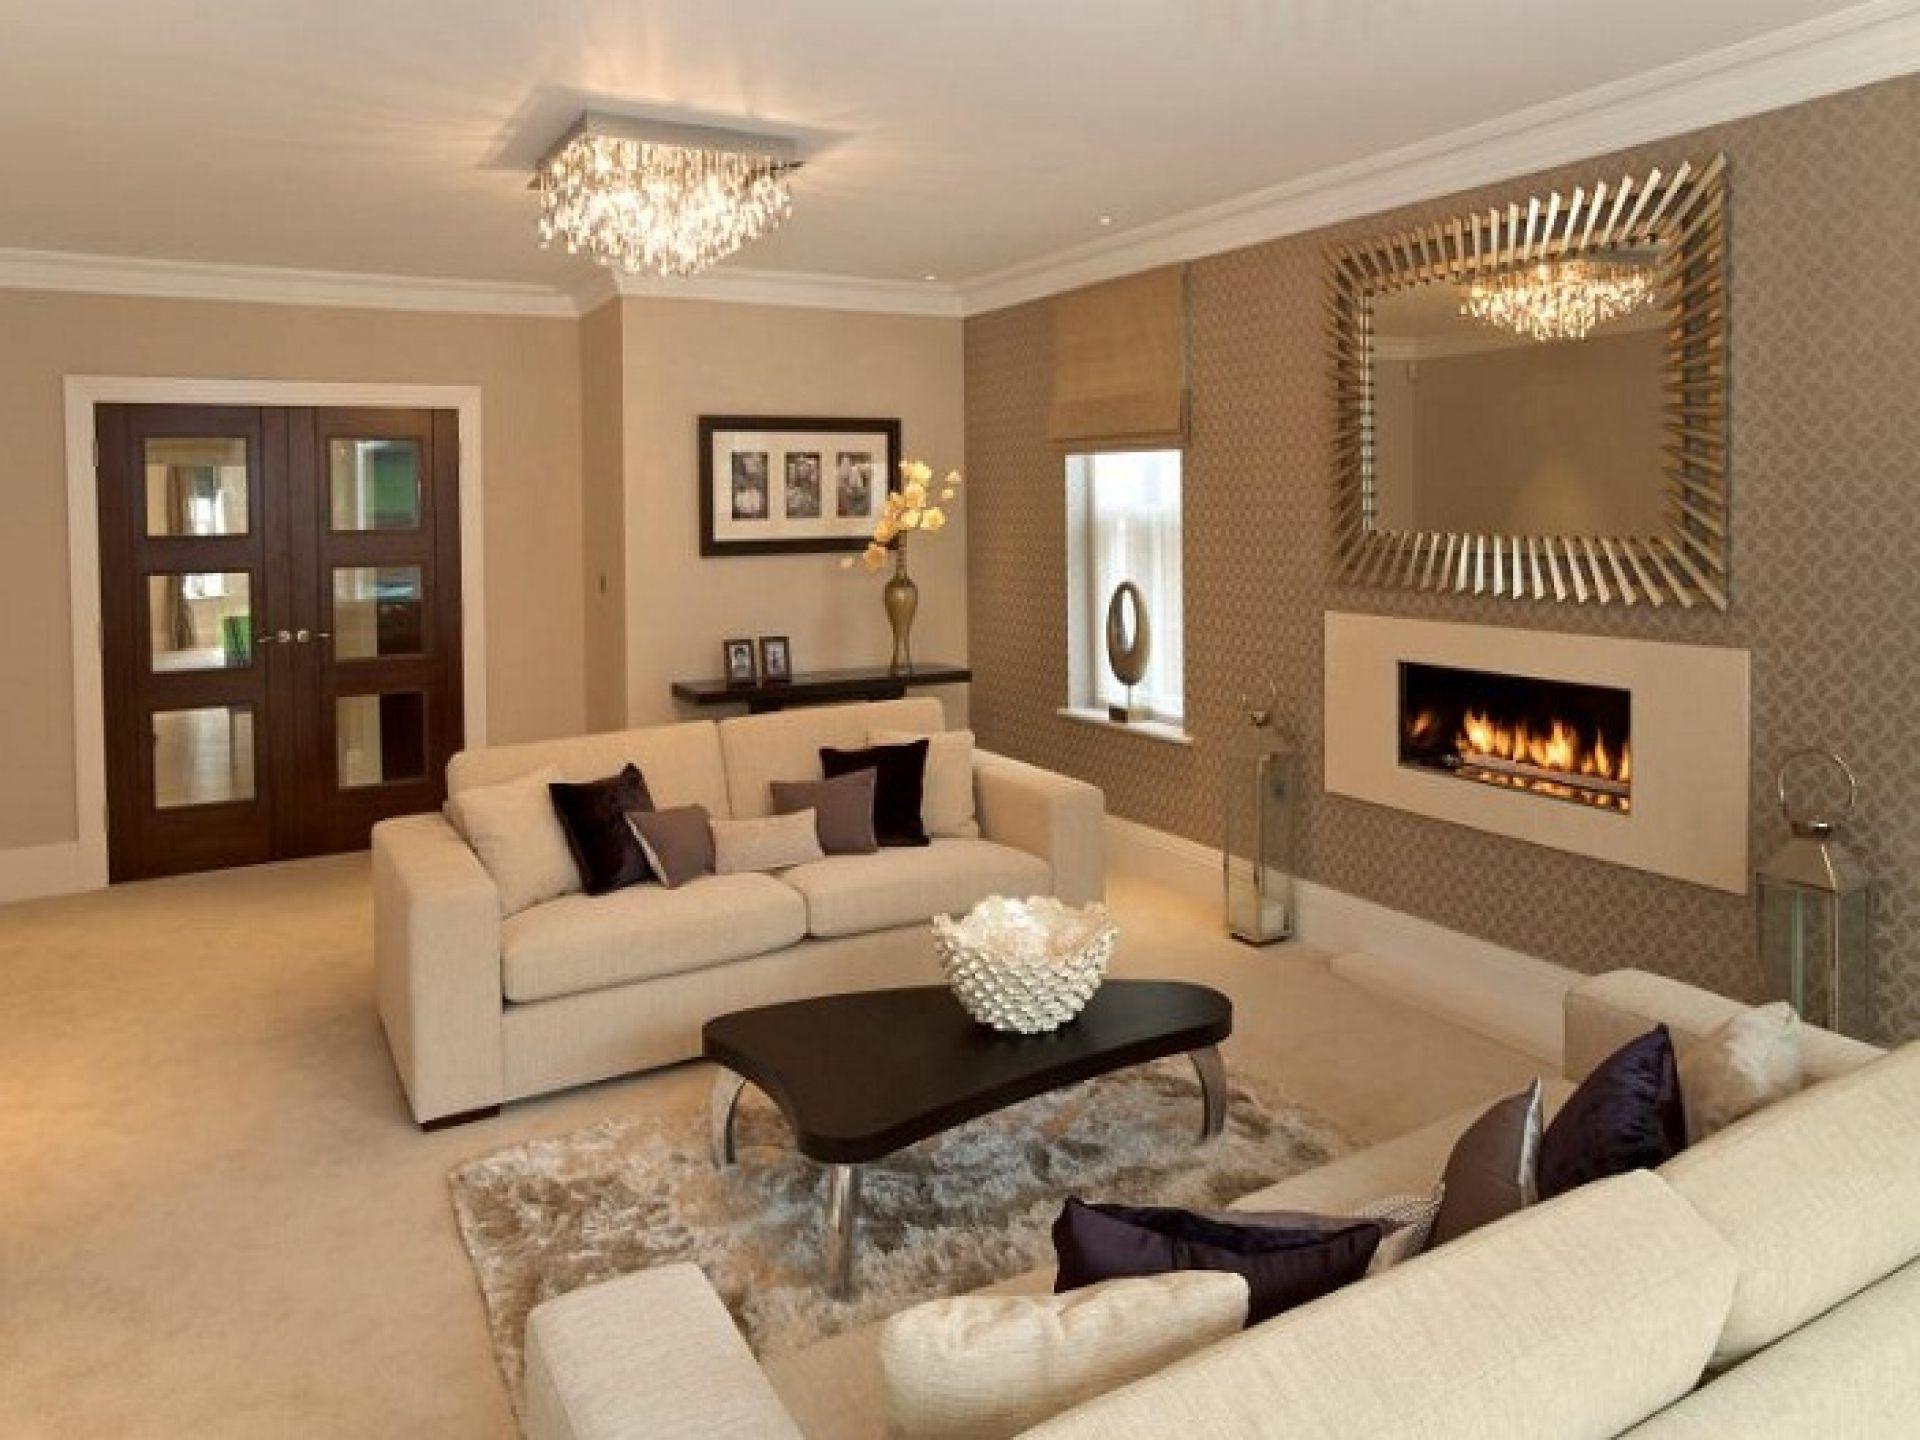 Interior design-ideen wohnzimmer mit tv  minimalist living room ideas u inspiration to make the most of